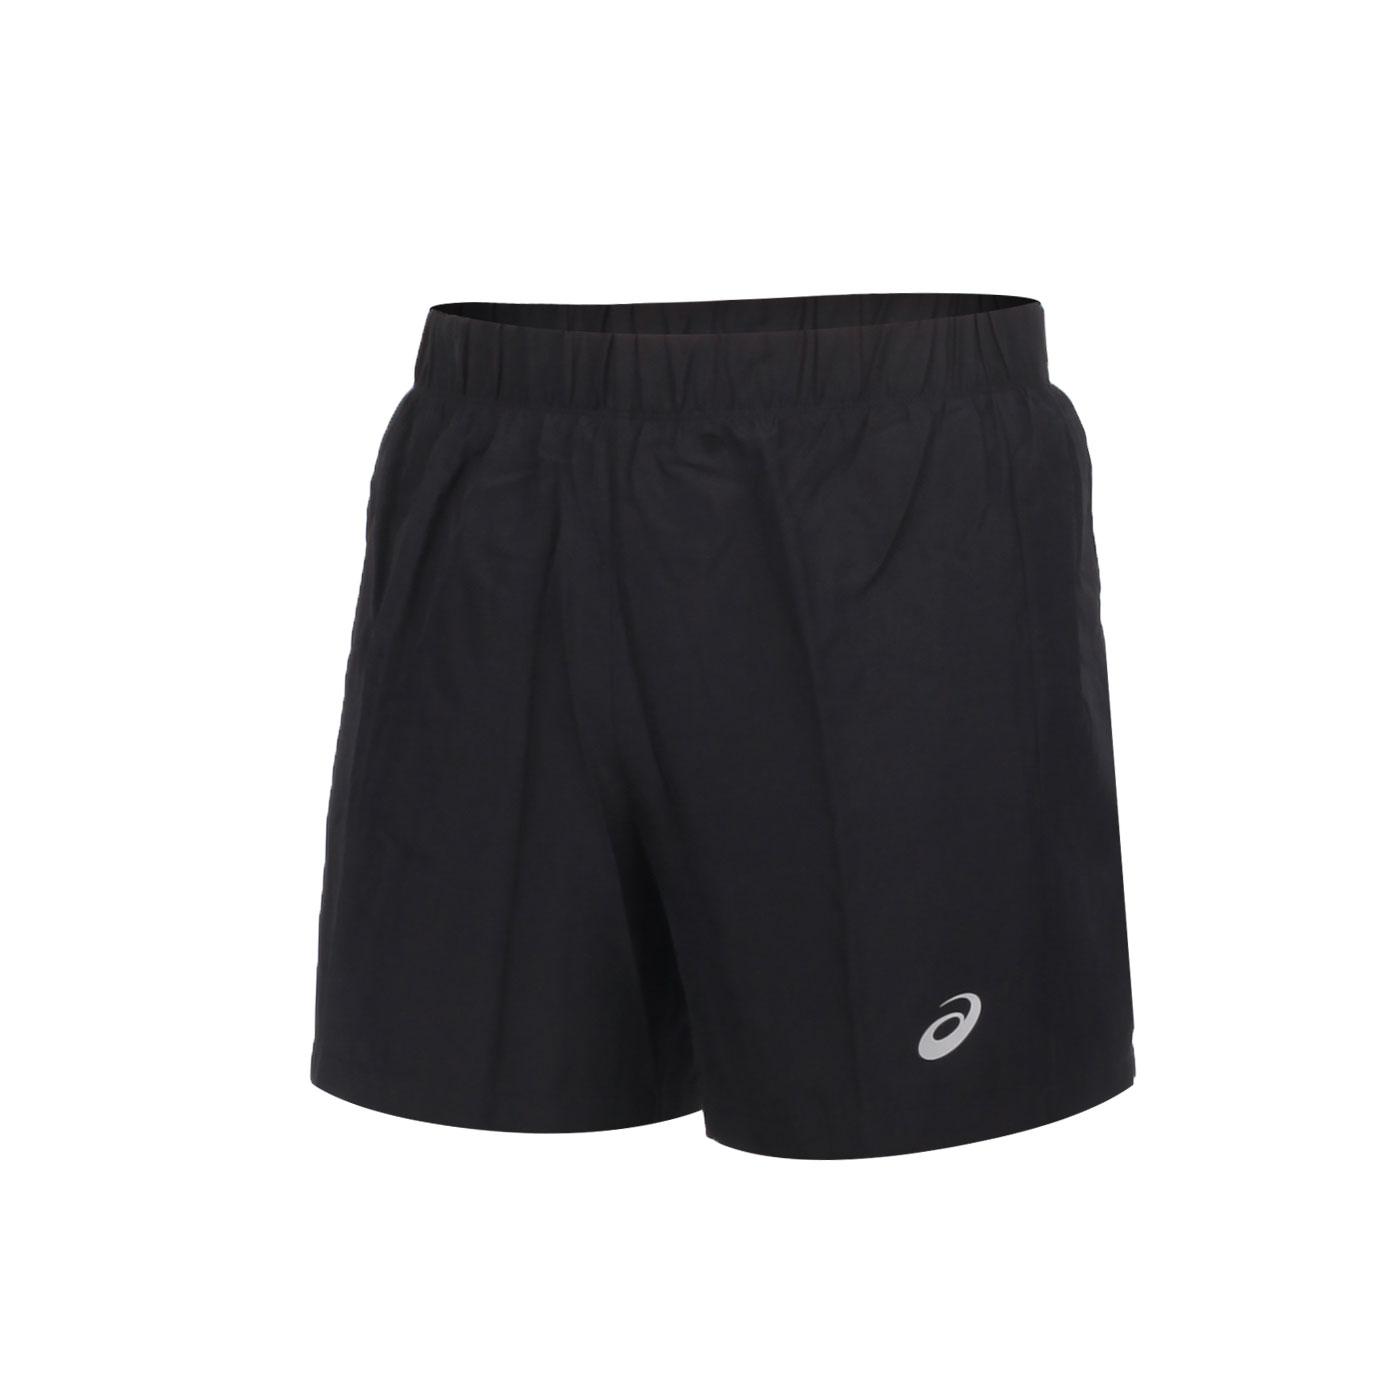 ASICS 男款片假名短褲 2011A952-002 - 黑銀